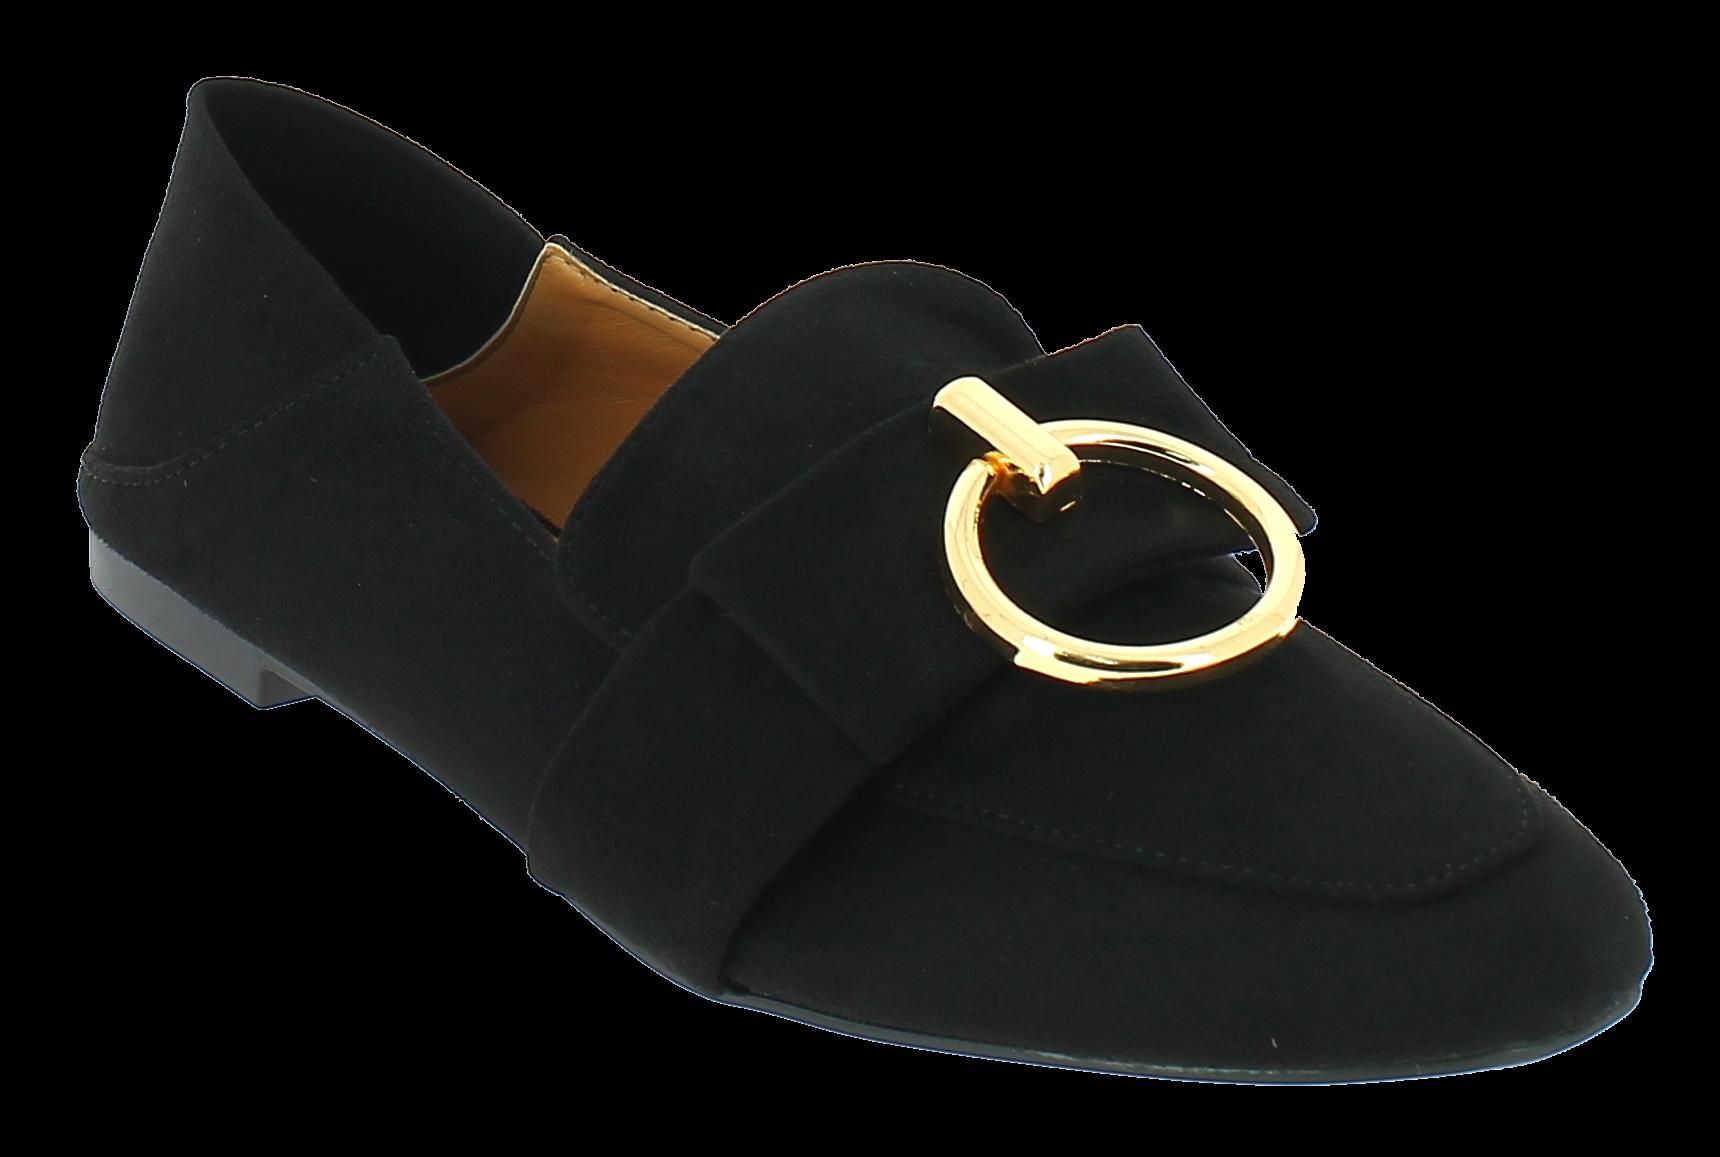 IQSHOES Γυναικεία Μπαλαρίνα 17510 Μαύρο - IqShoes - 17510 BLACK-black-38/1/15/11 παπούτσια  new in